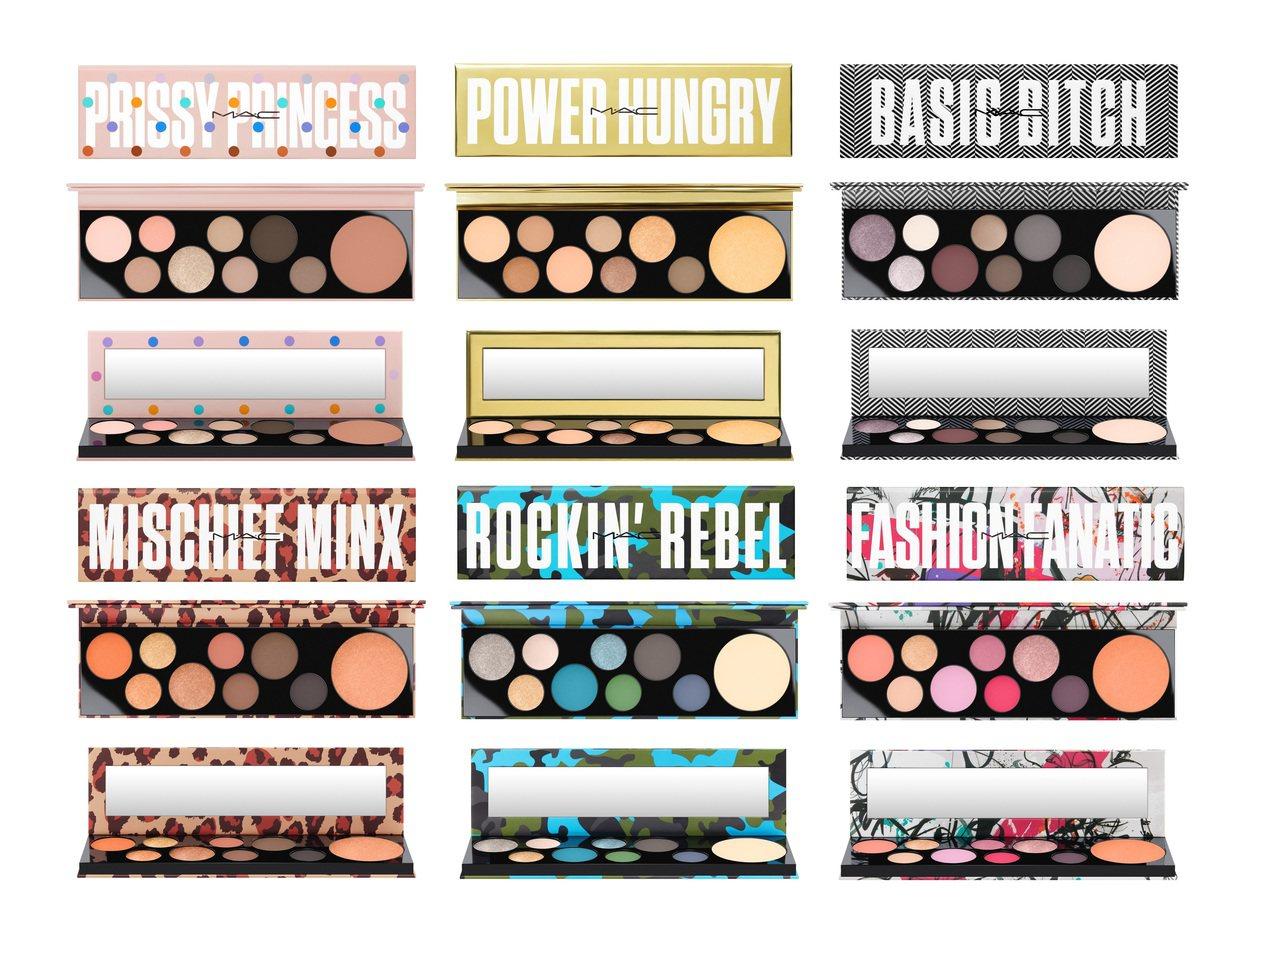 M‧A‧C全新推出限量的壞女孩眼頰盤,共有6組反應不同性格特質的色彩選色。圖/M...